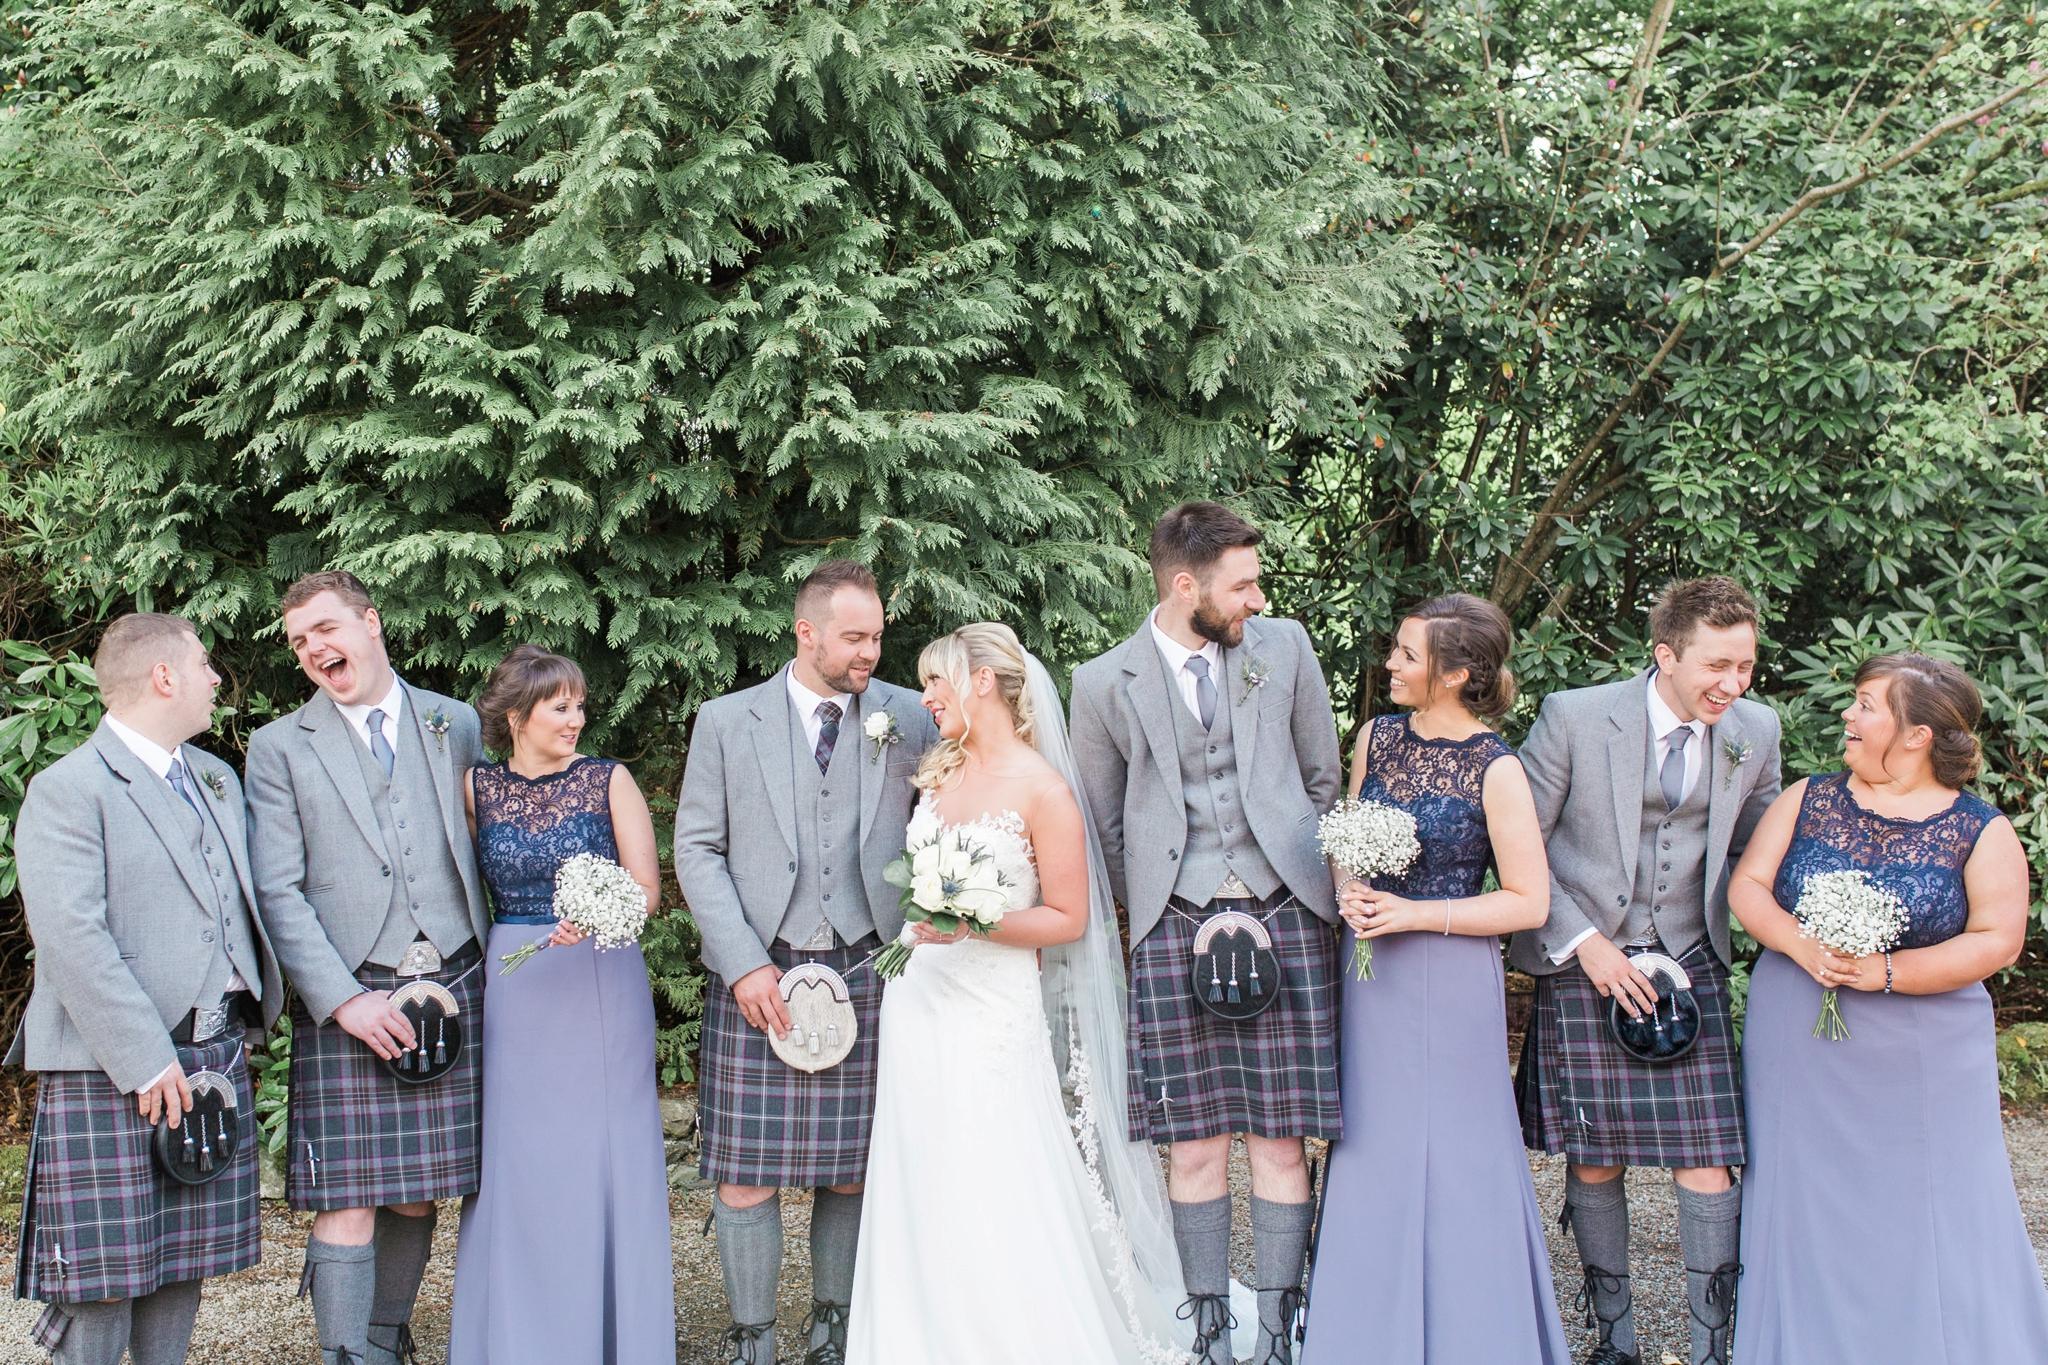 Suzanne_li_photography_Roman_camp_wedding_0015.jpg